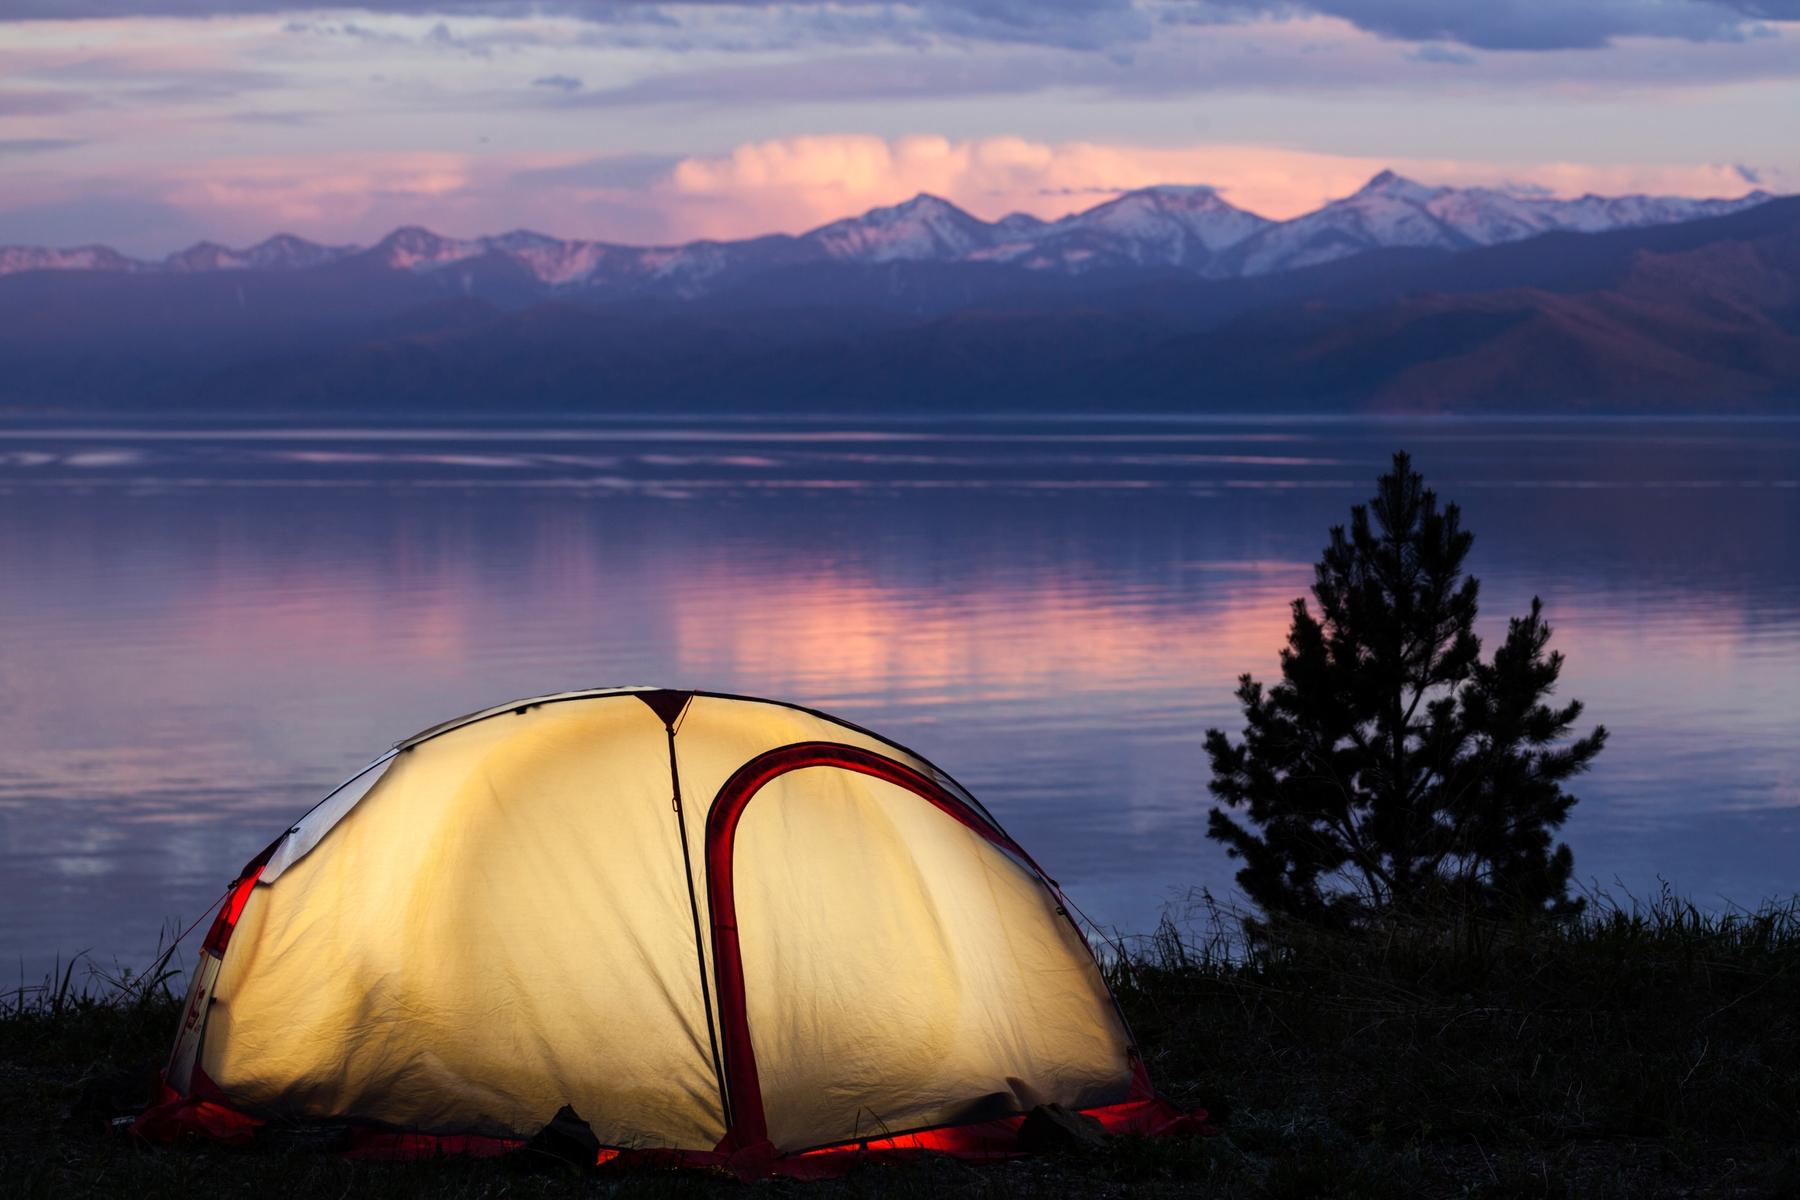 Чем заняться в Бурятии: съездить на Байкал из Улан-Удэ